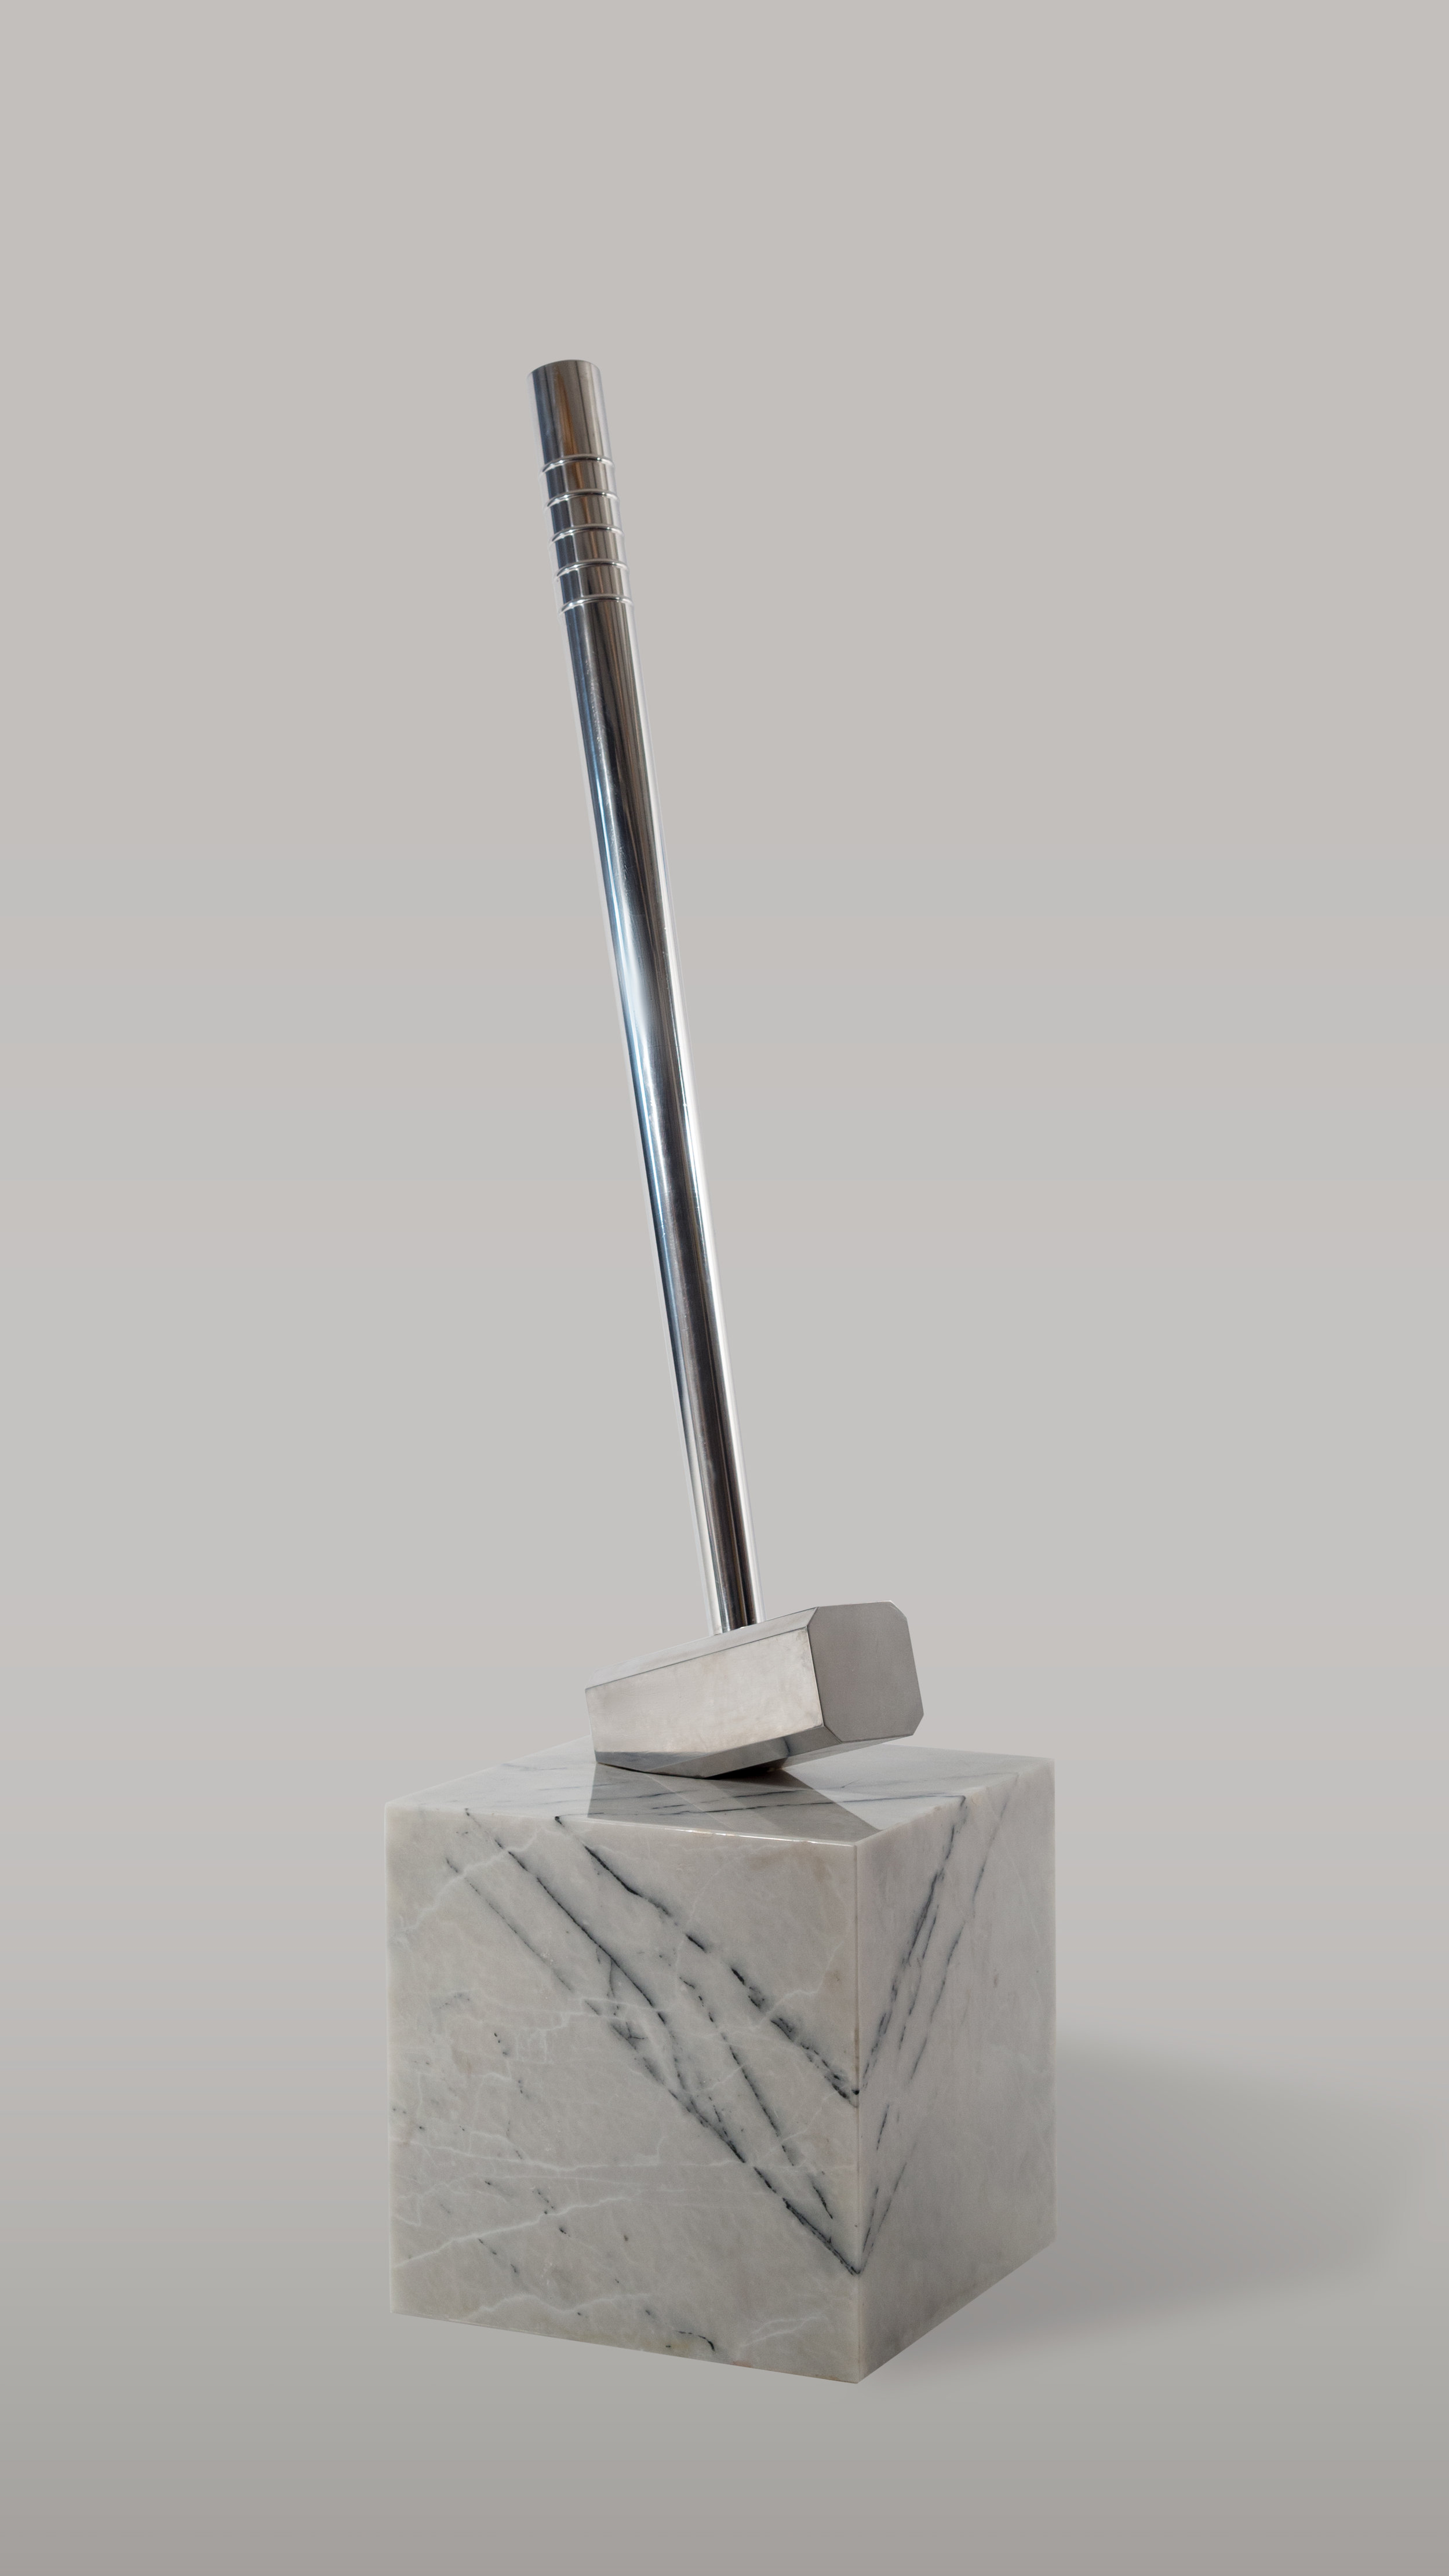 Aluminum Sledgehammer in Marble Cube, 2017. Ahmet Civelek